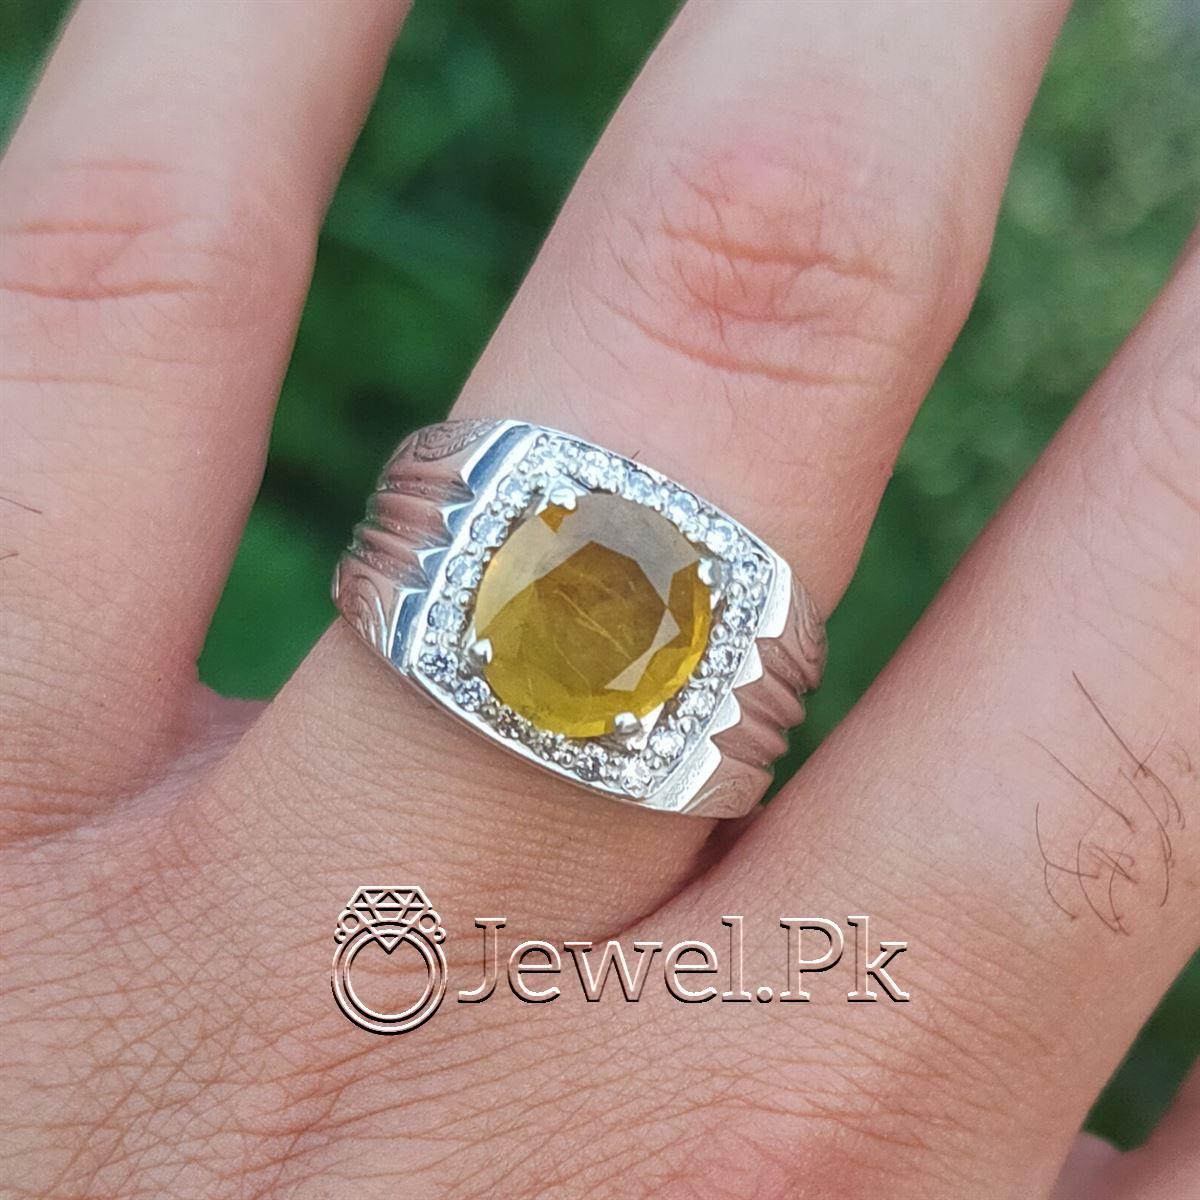 Natural Yellow Sapphire Ring Pukhraj Ring buy online Handmade Ring 5 natural gemstones pakistan + 925 silver jewelry online